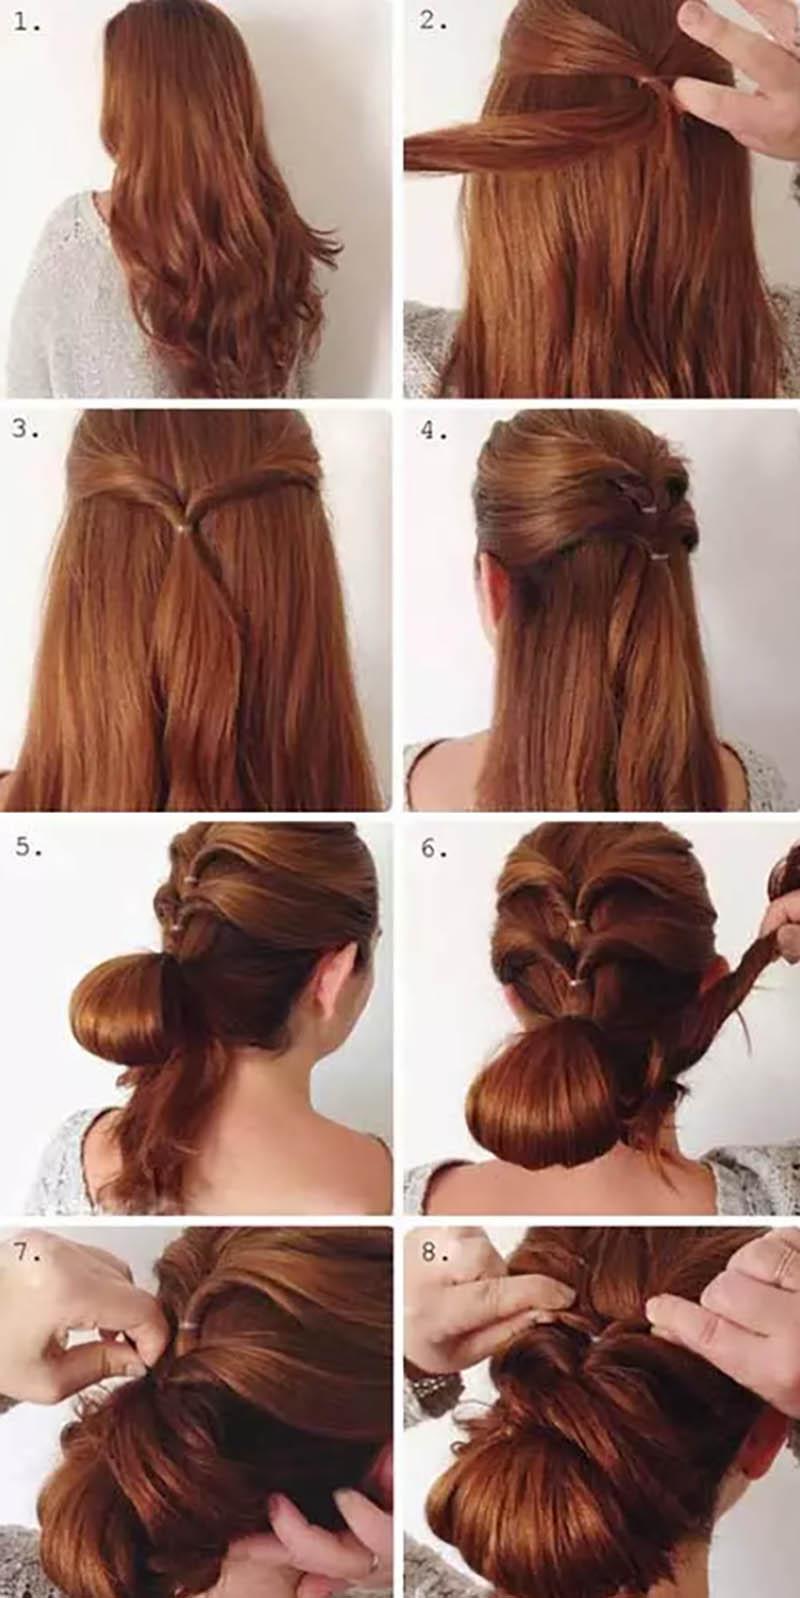 Búi tóc kiểu xoắn vòng